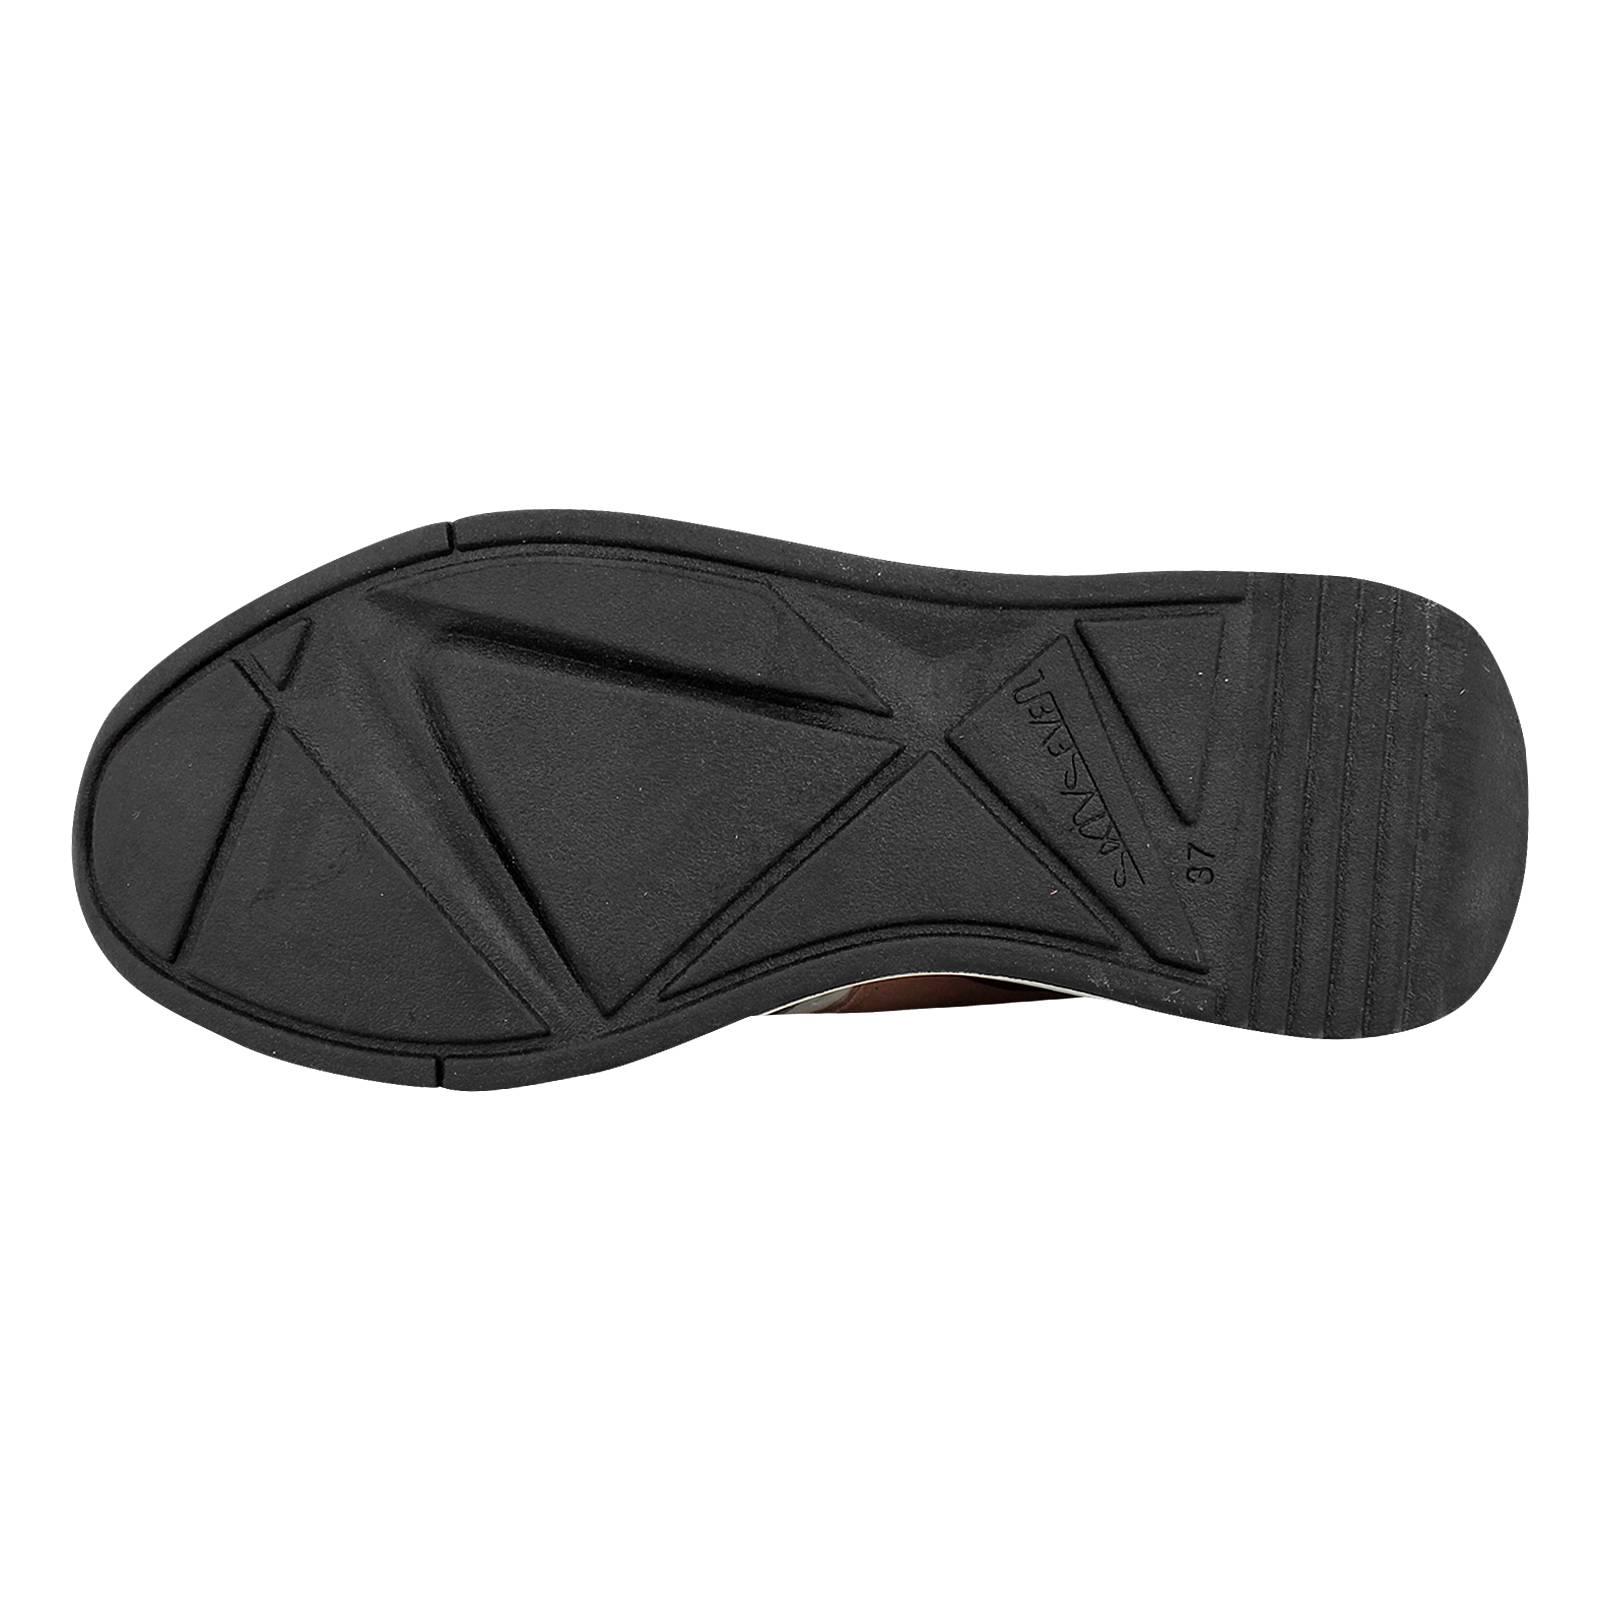 Cheia - Γυναικεία παπούτσια casual Sixty Seven από καστορι και ... bfa9924a966